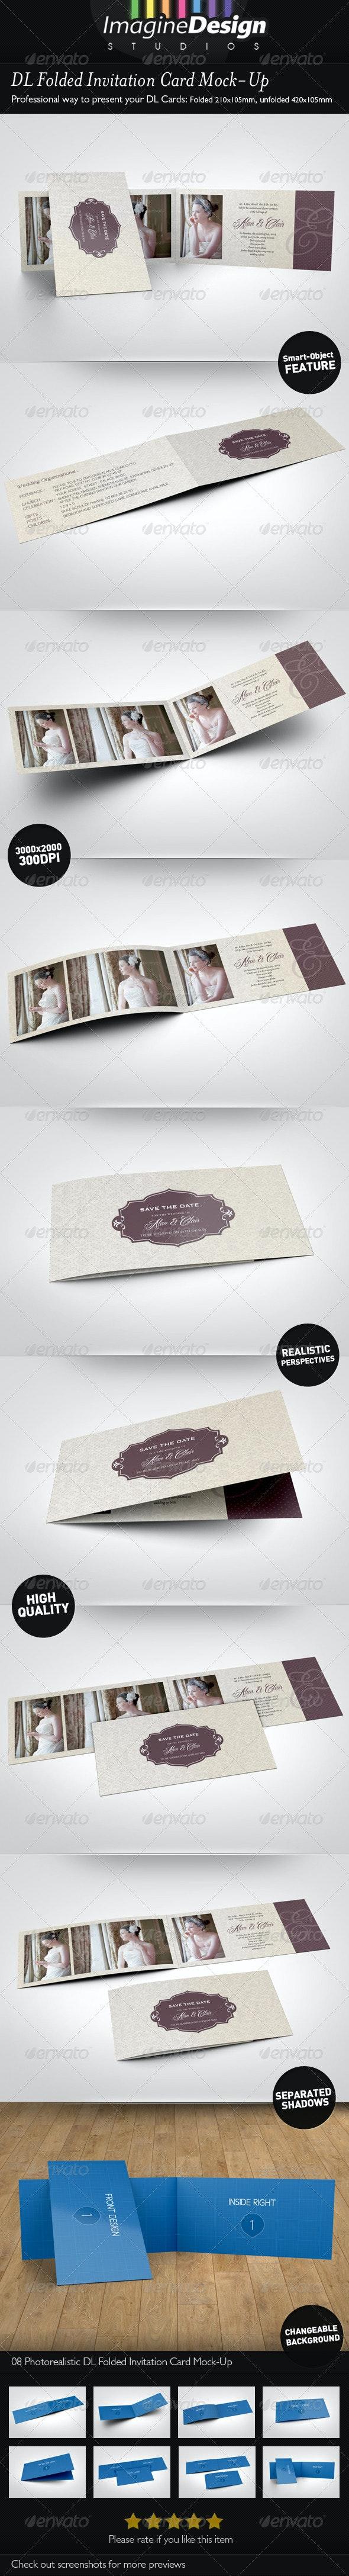 DL Folded Invitation Card Mock-Up - Print Product Mock-Ups